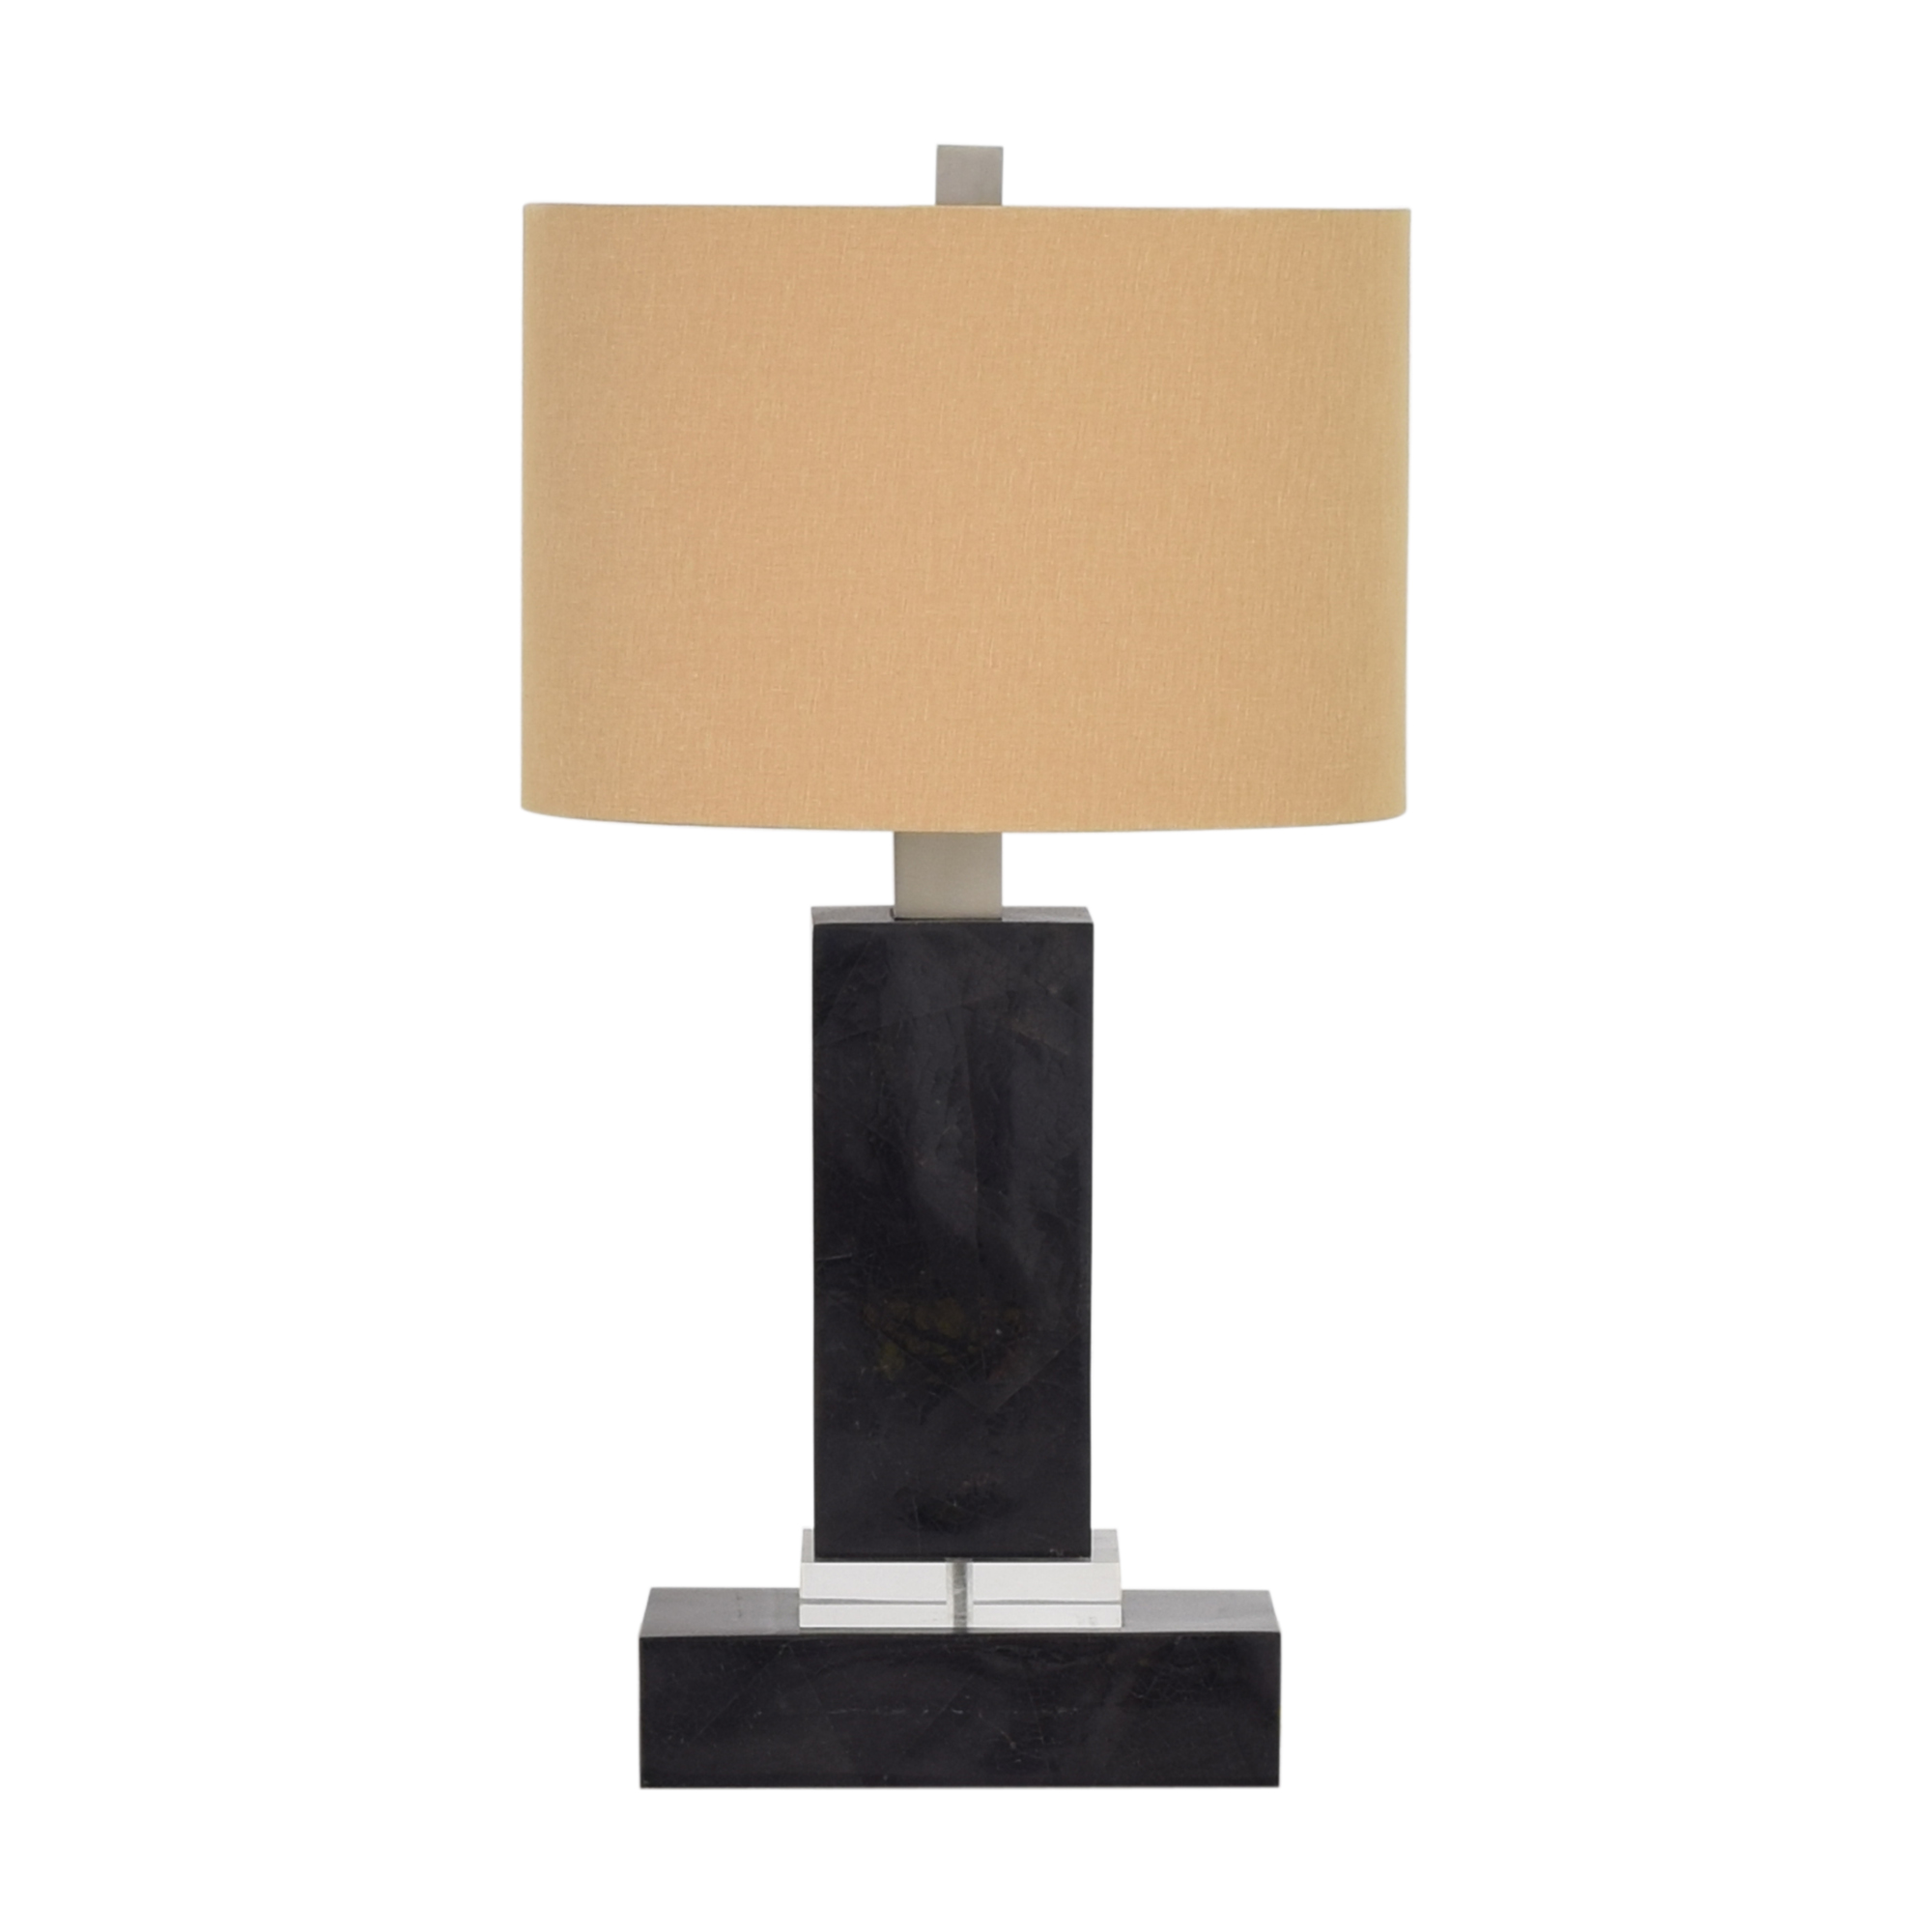 John-Richard John-Richard Table Lamp ct